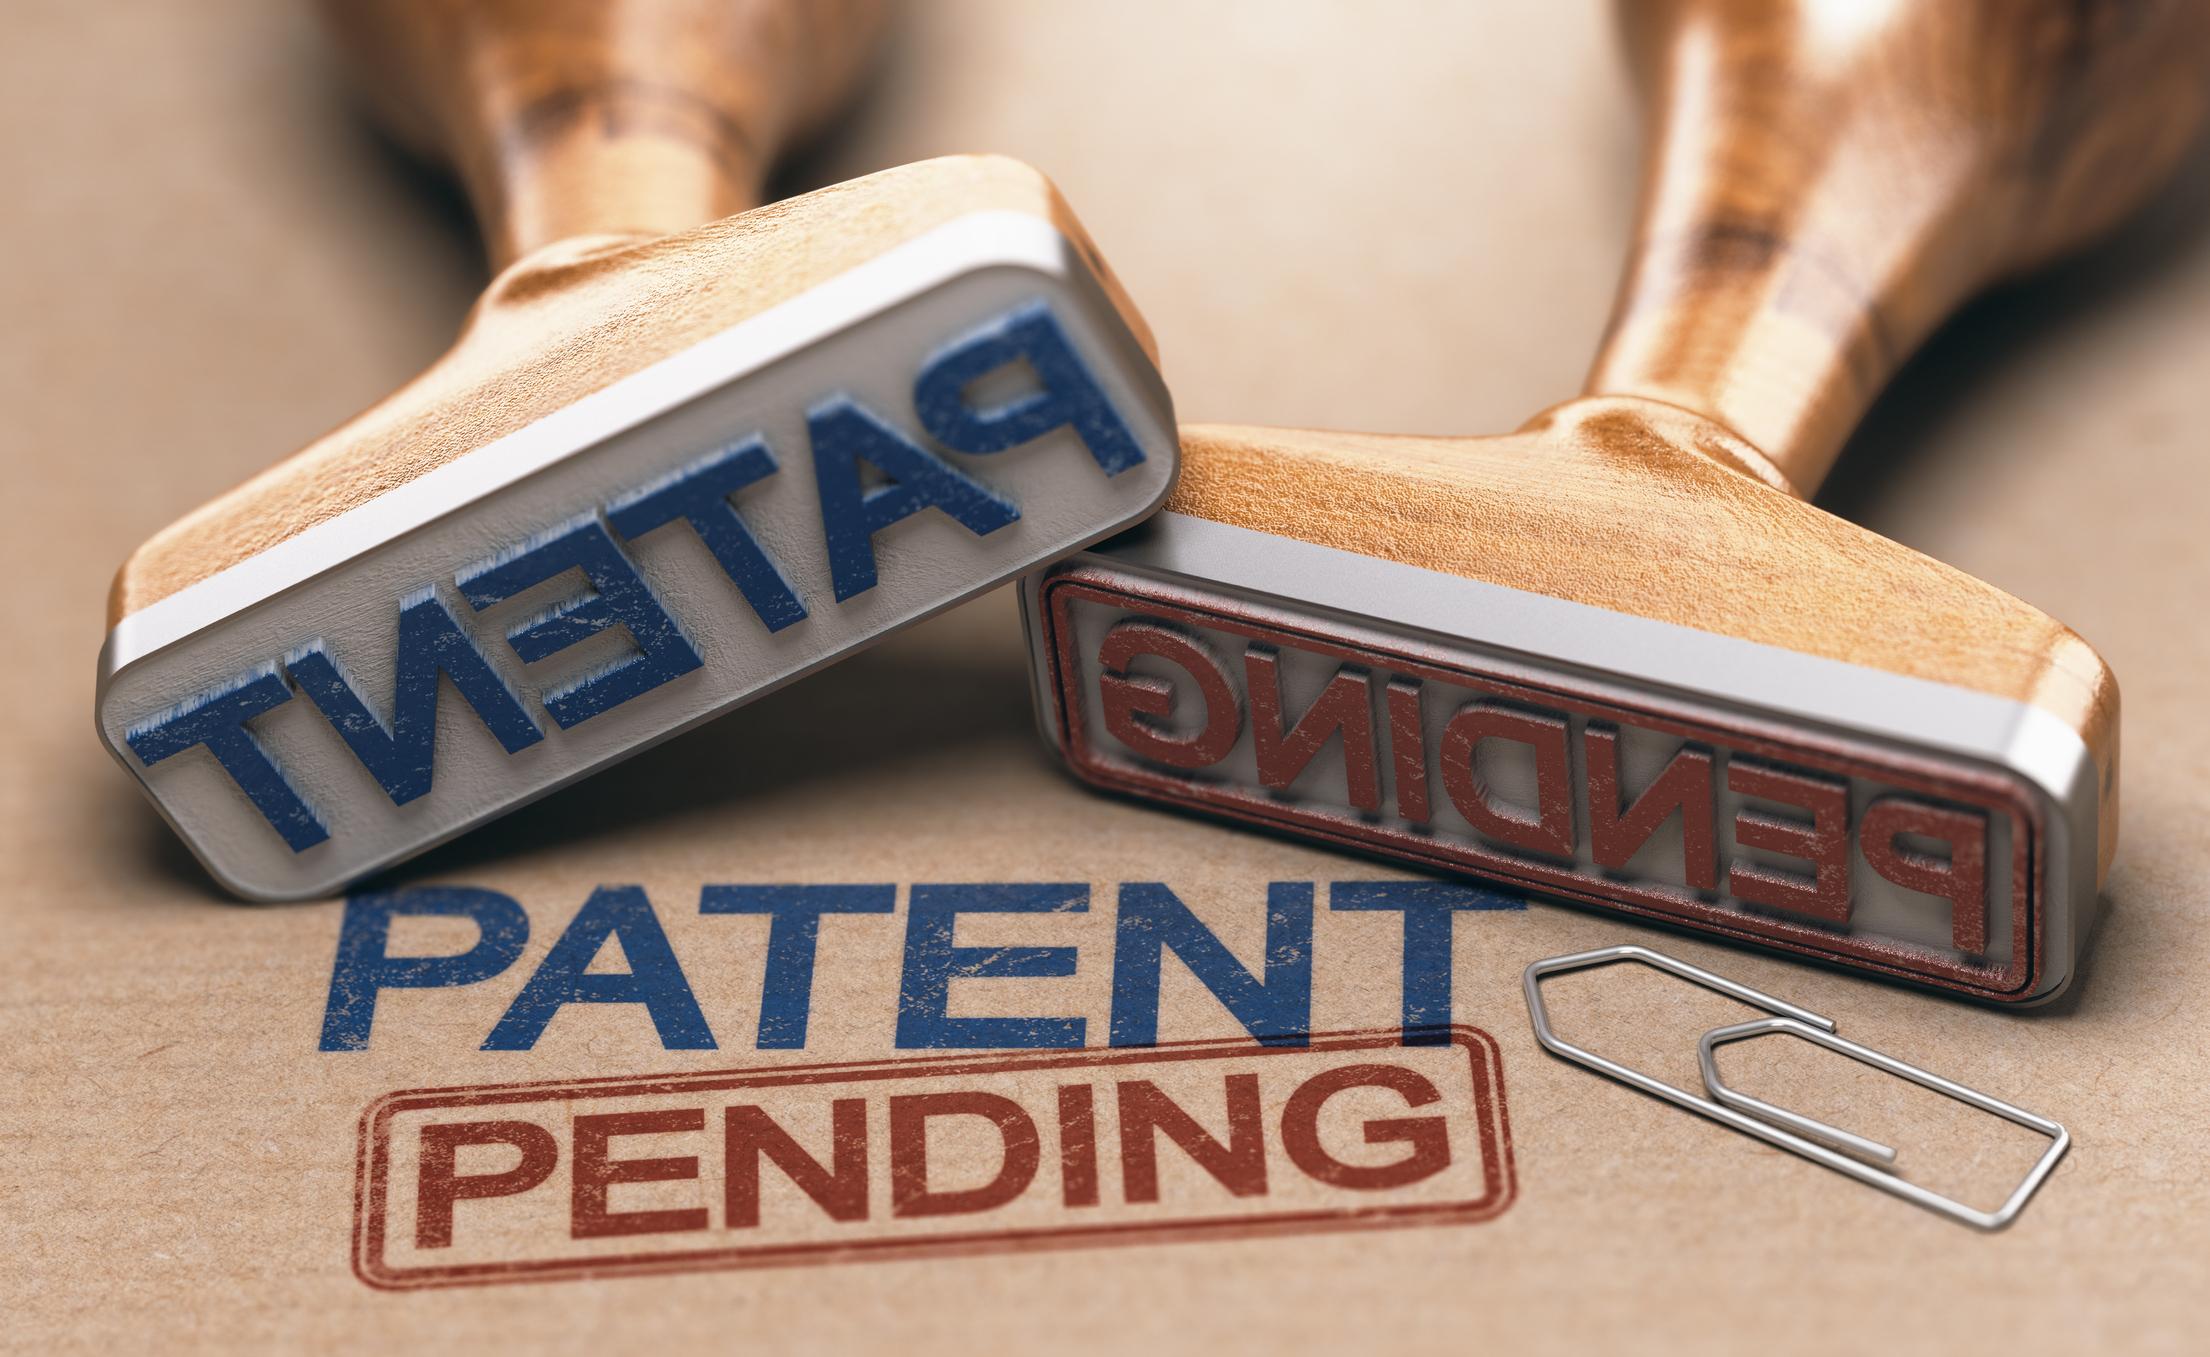 Patent Pending Concept